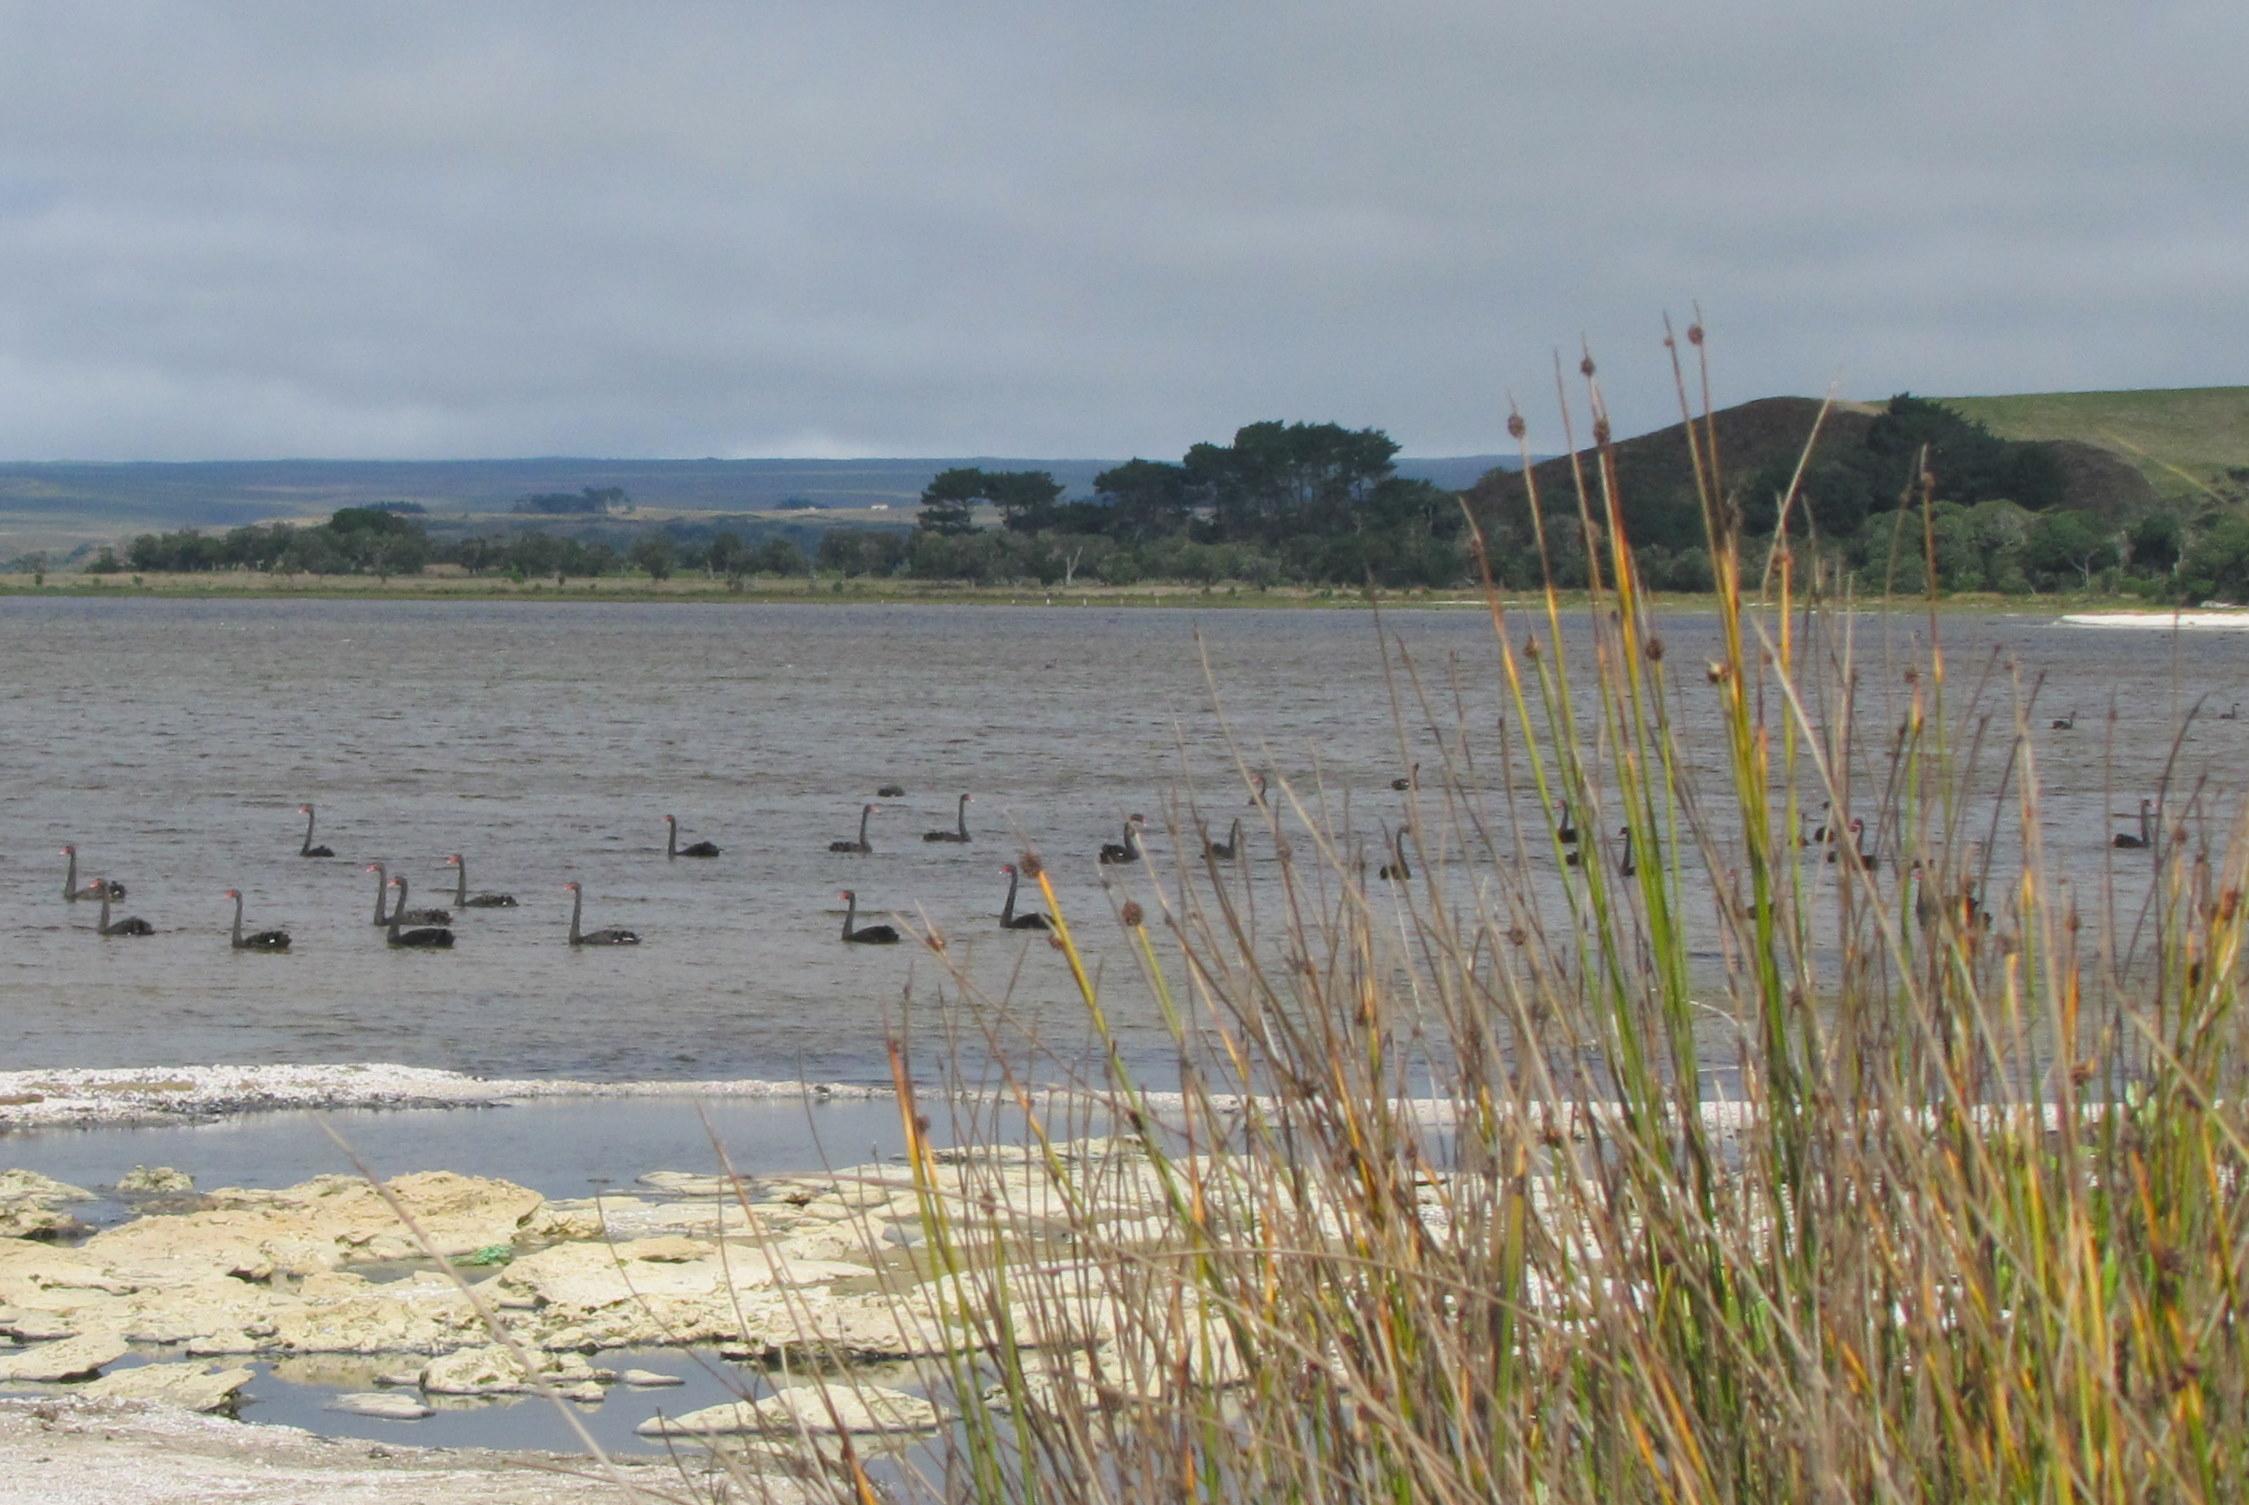 Black swans were in abundance in the lagoon.